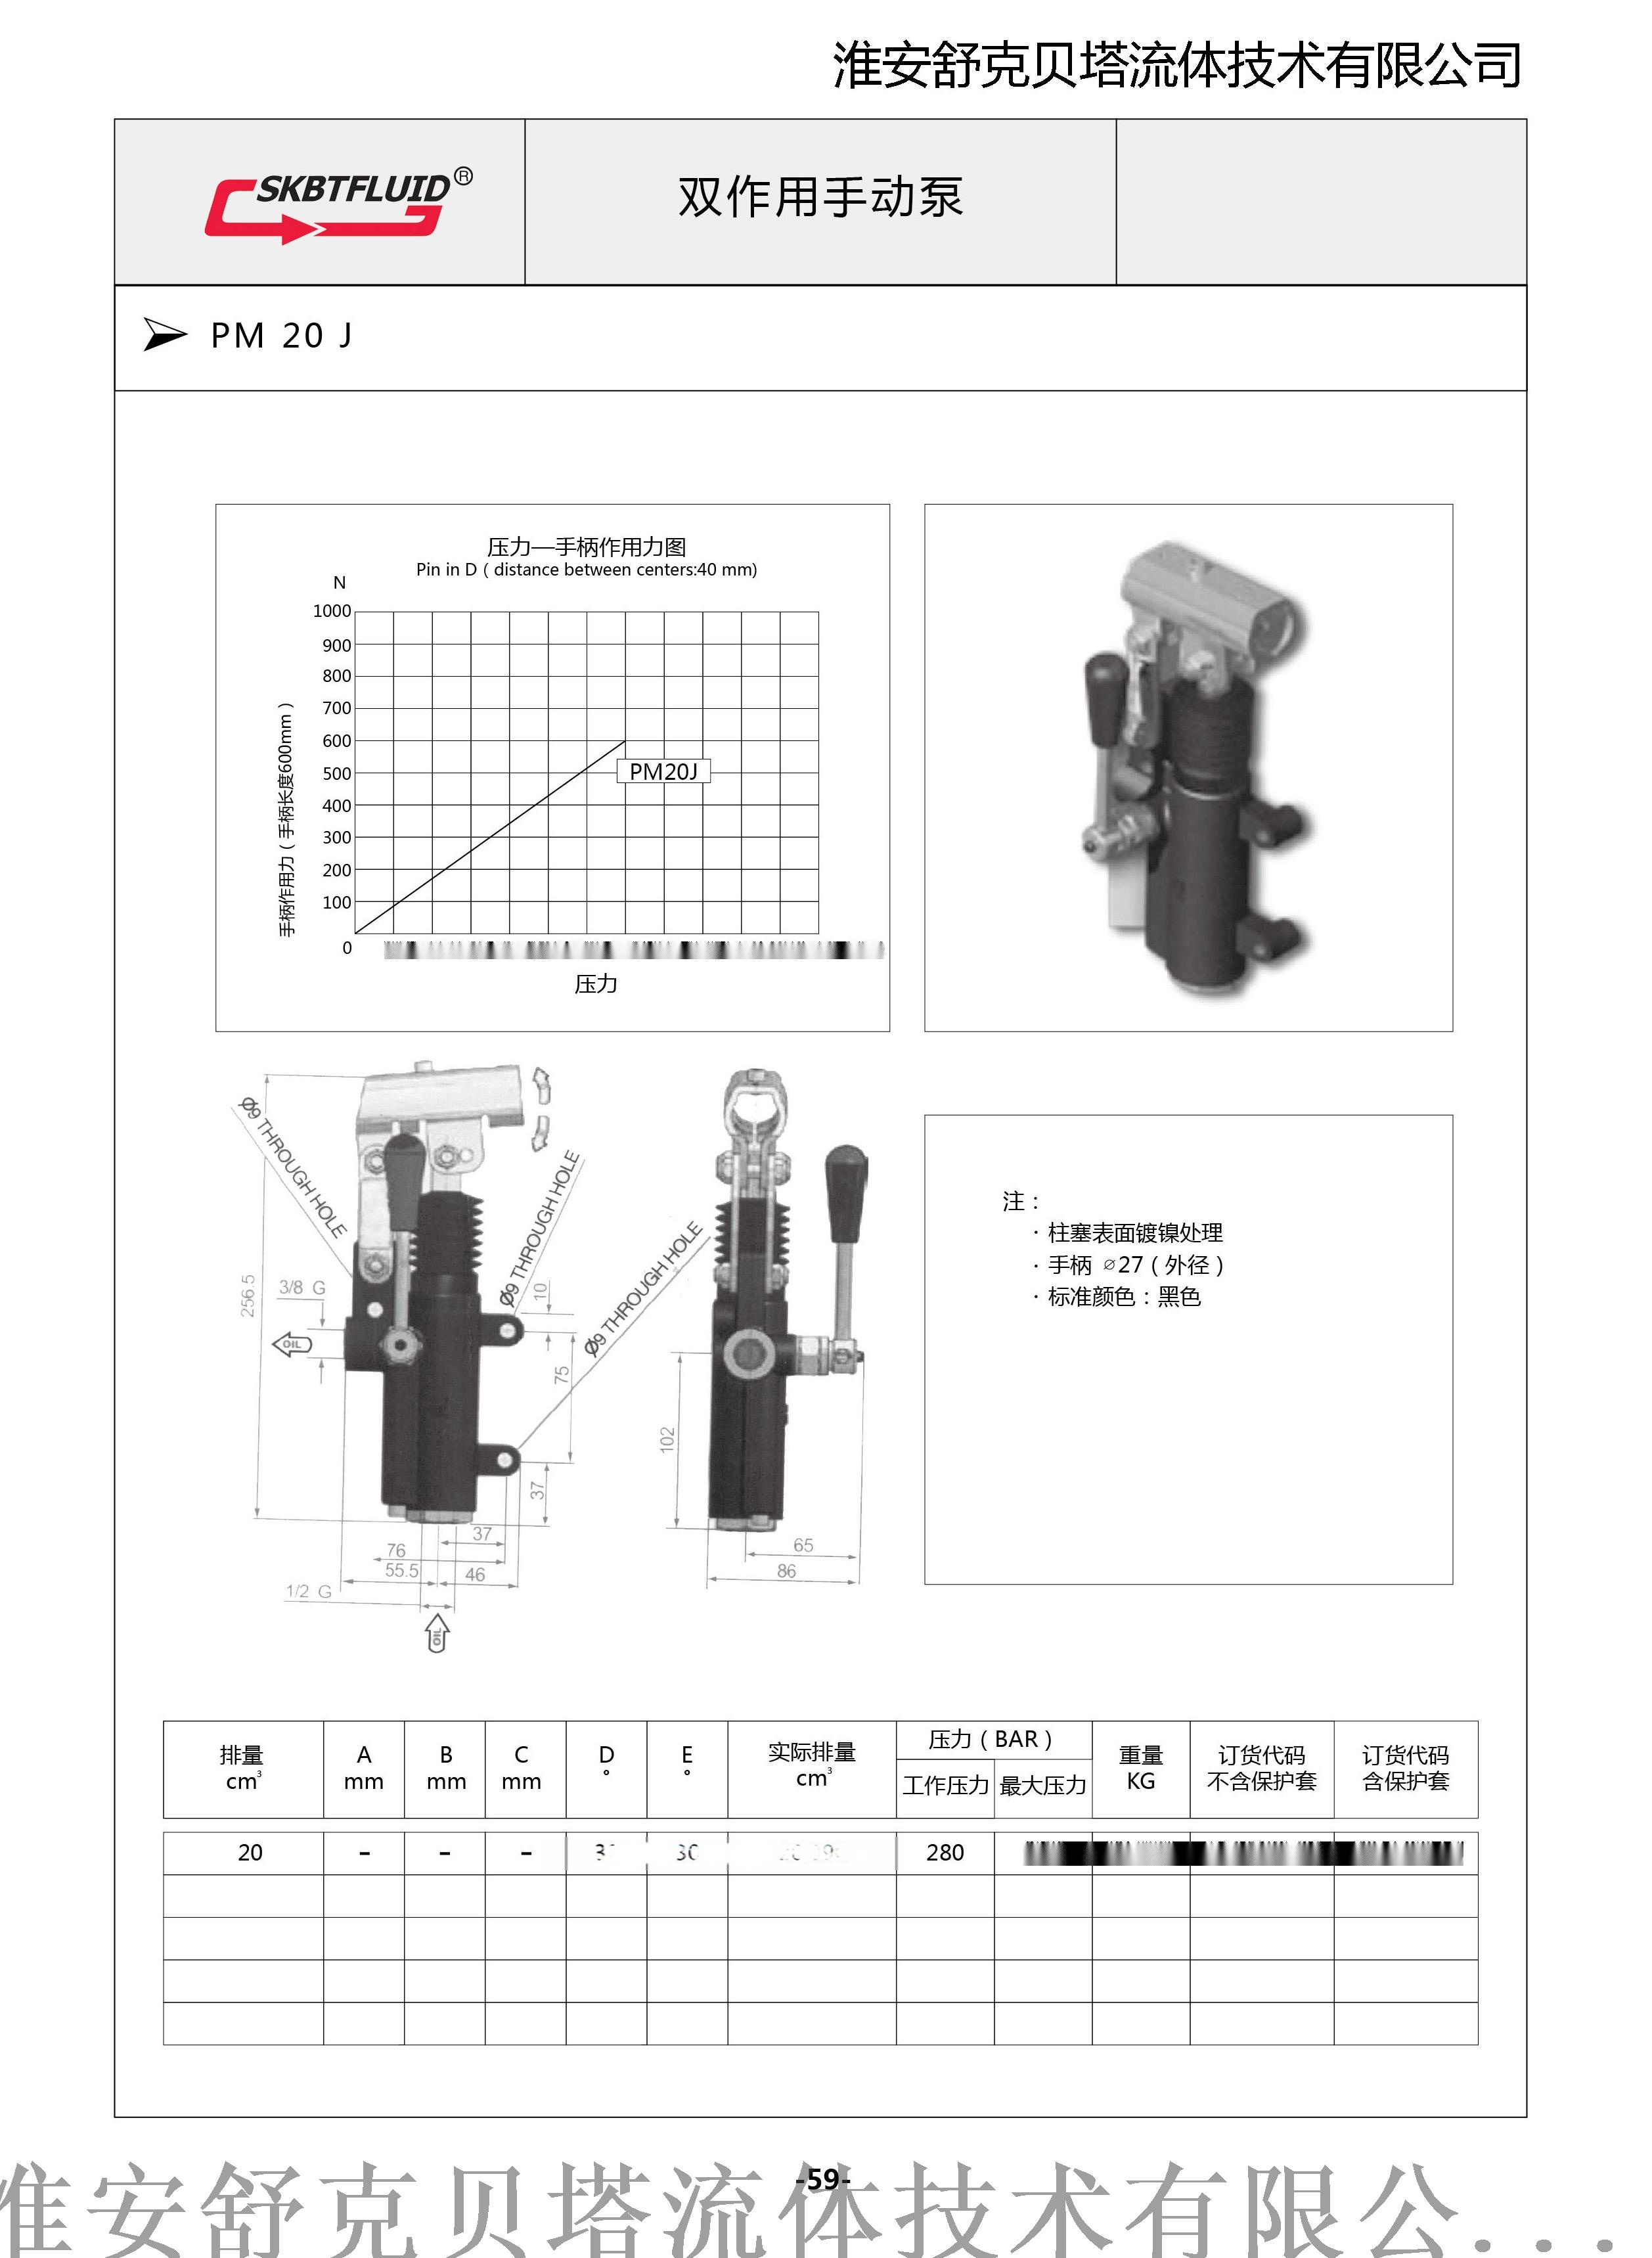 PM25单作用手动泵95338725